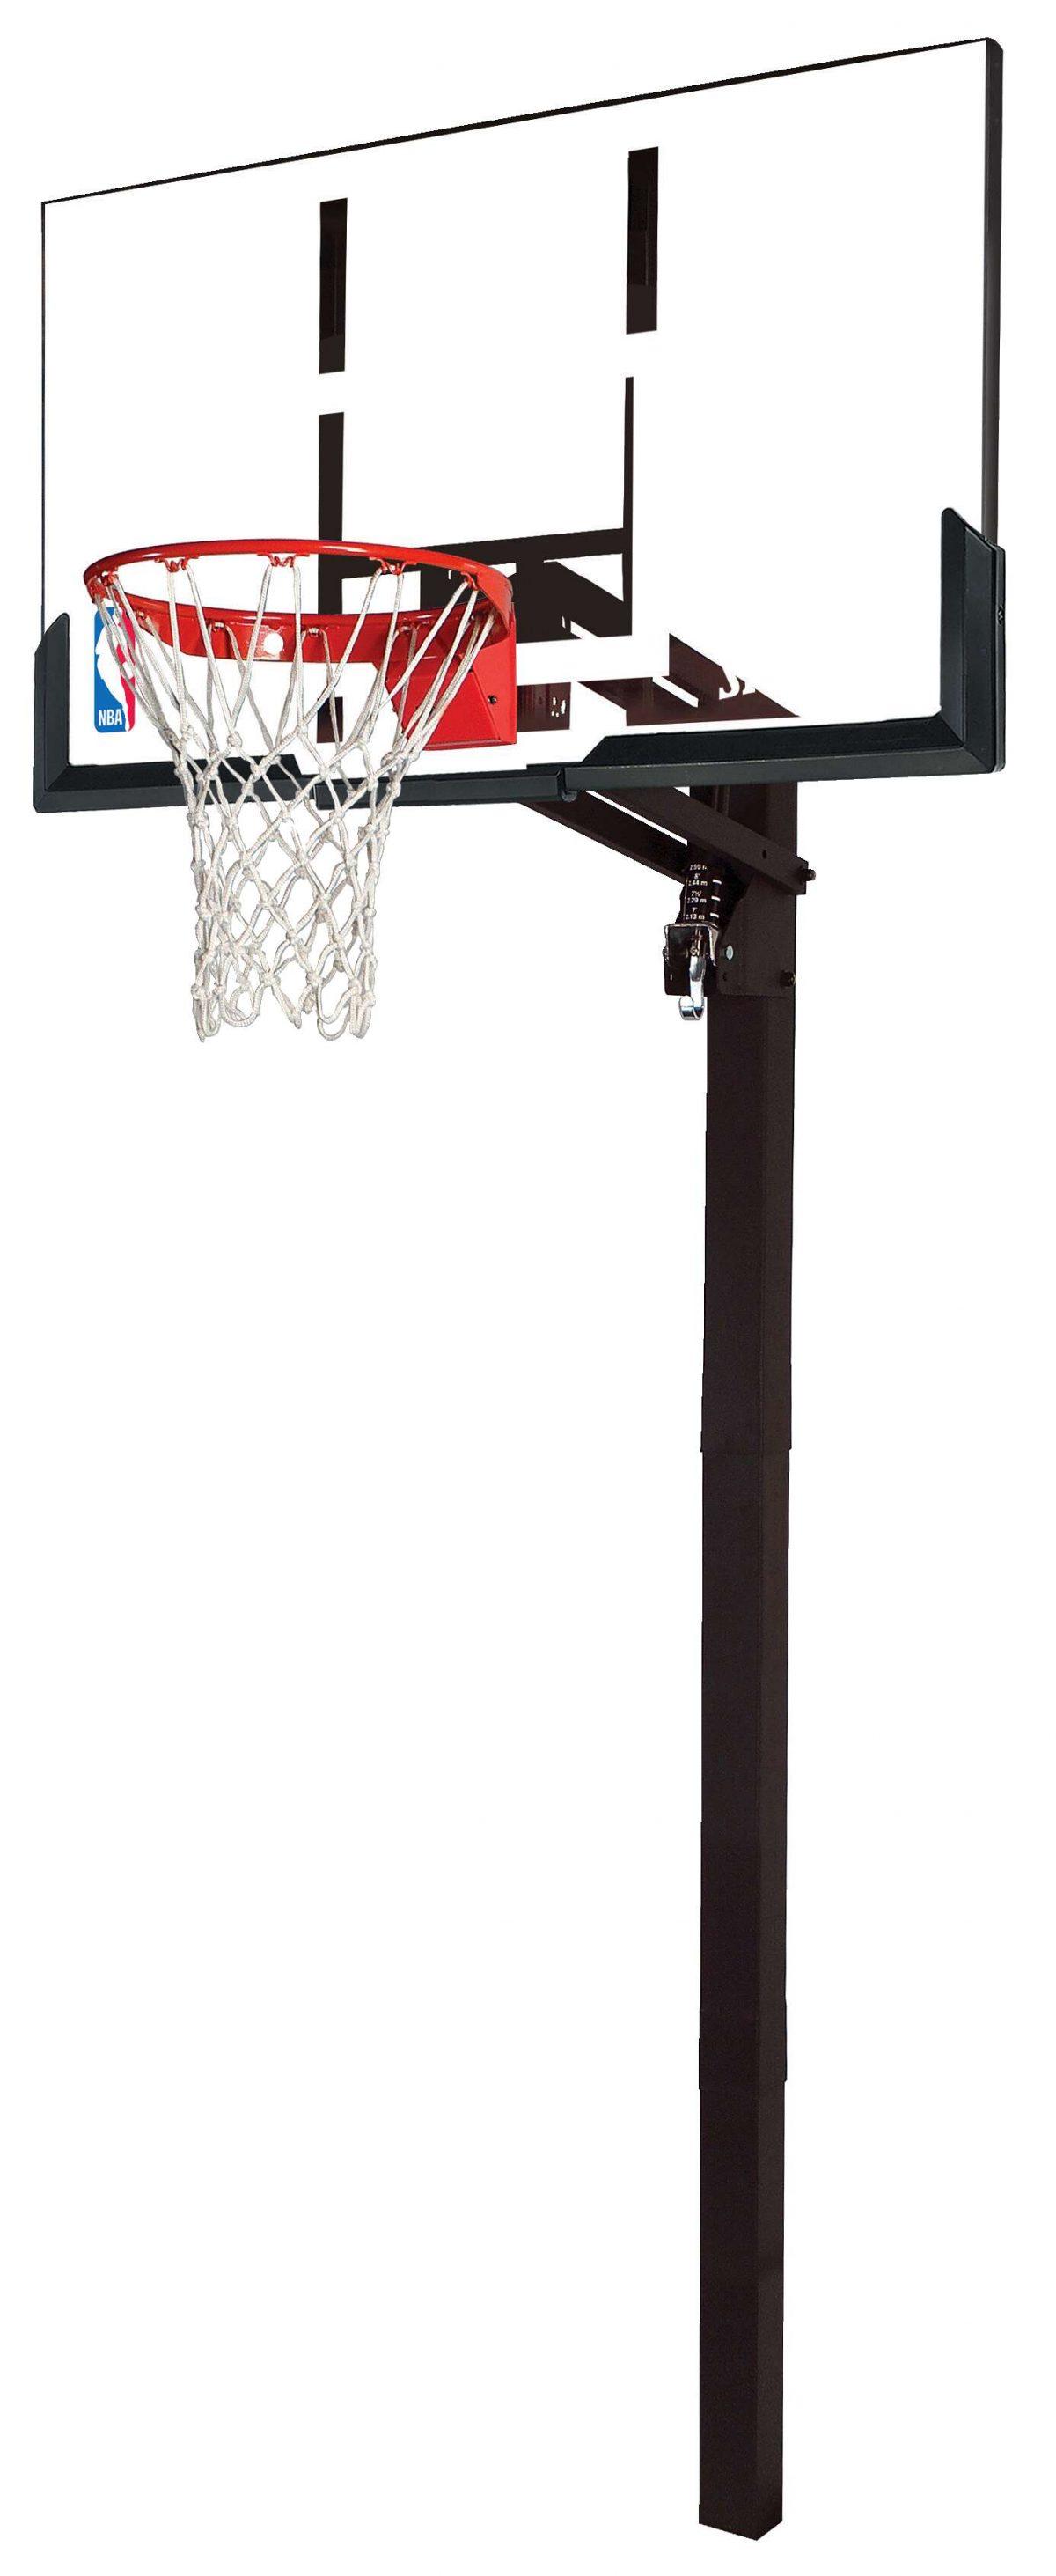 "Spalding Basketballanlage ""NBA Gold Exacta High Lift In-Ground"" - Teamsport - Spalding"